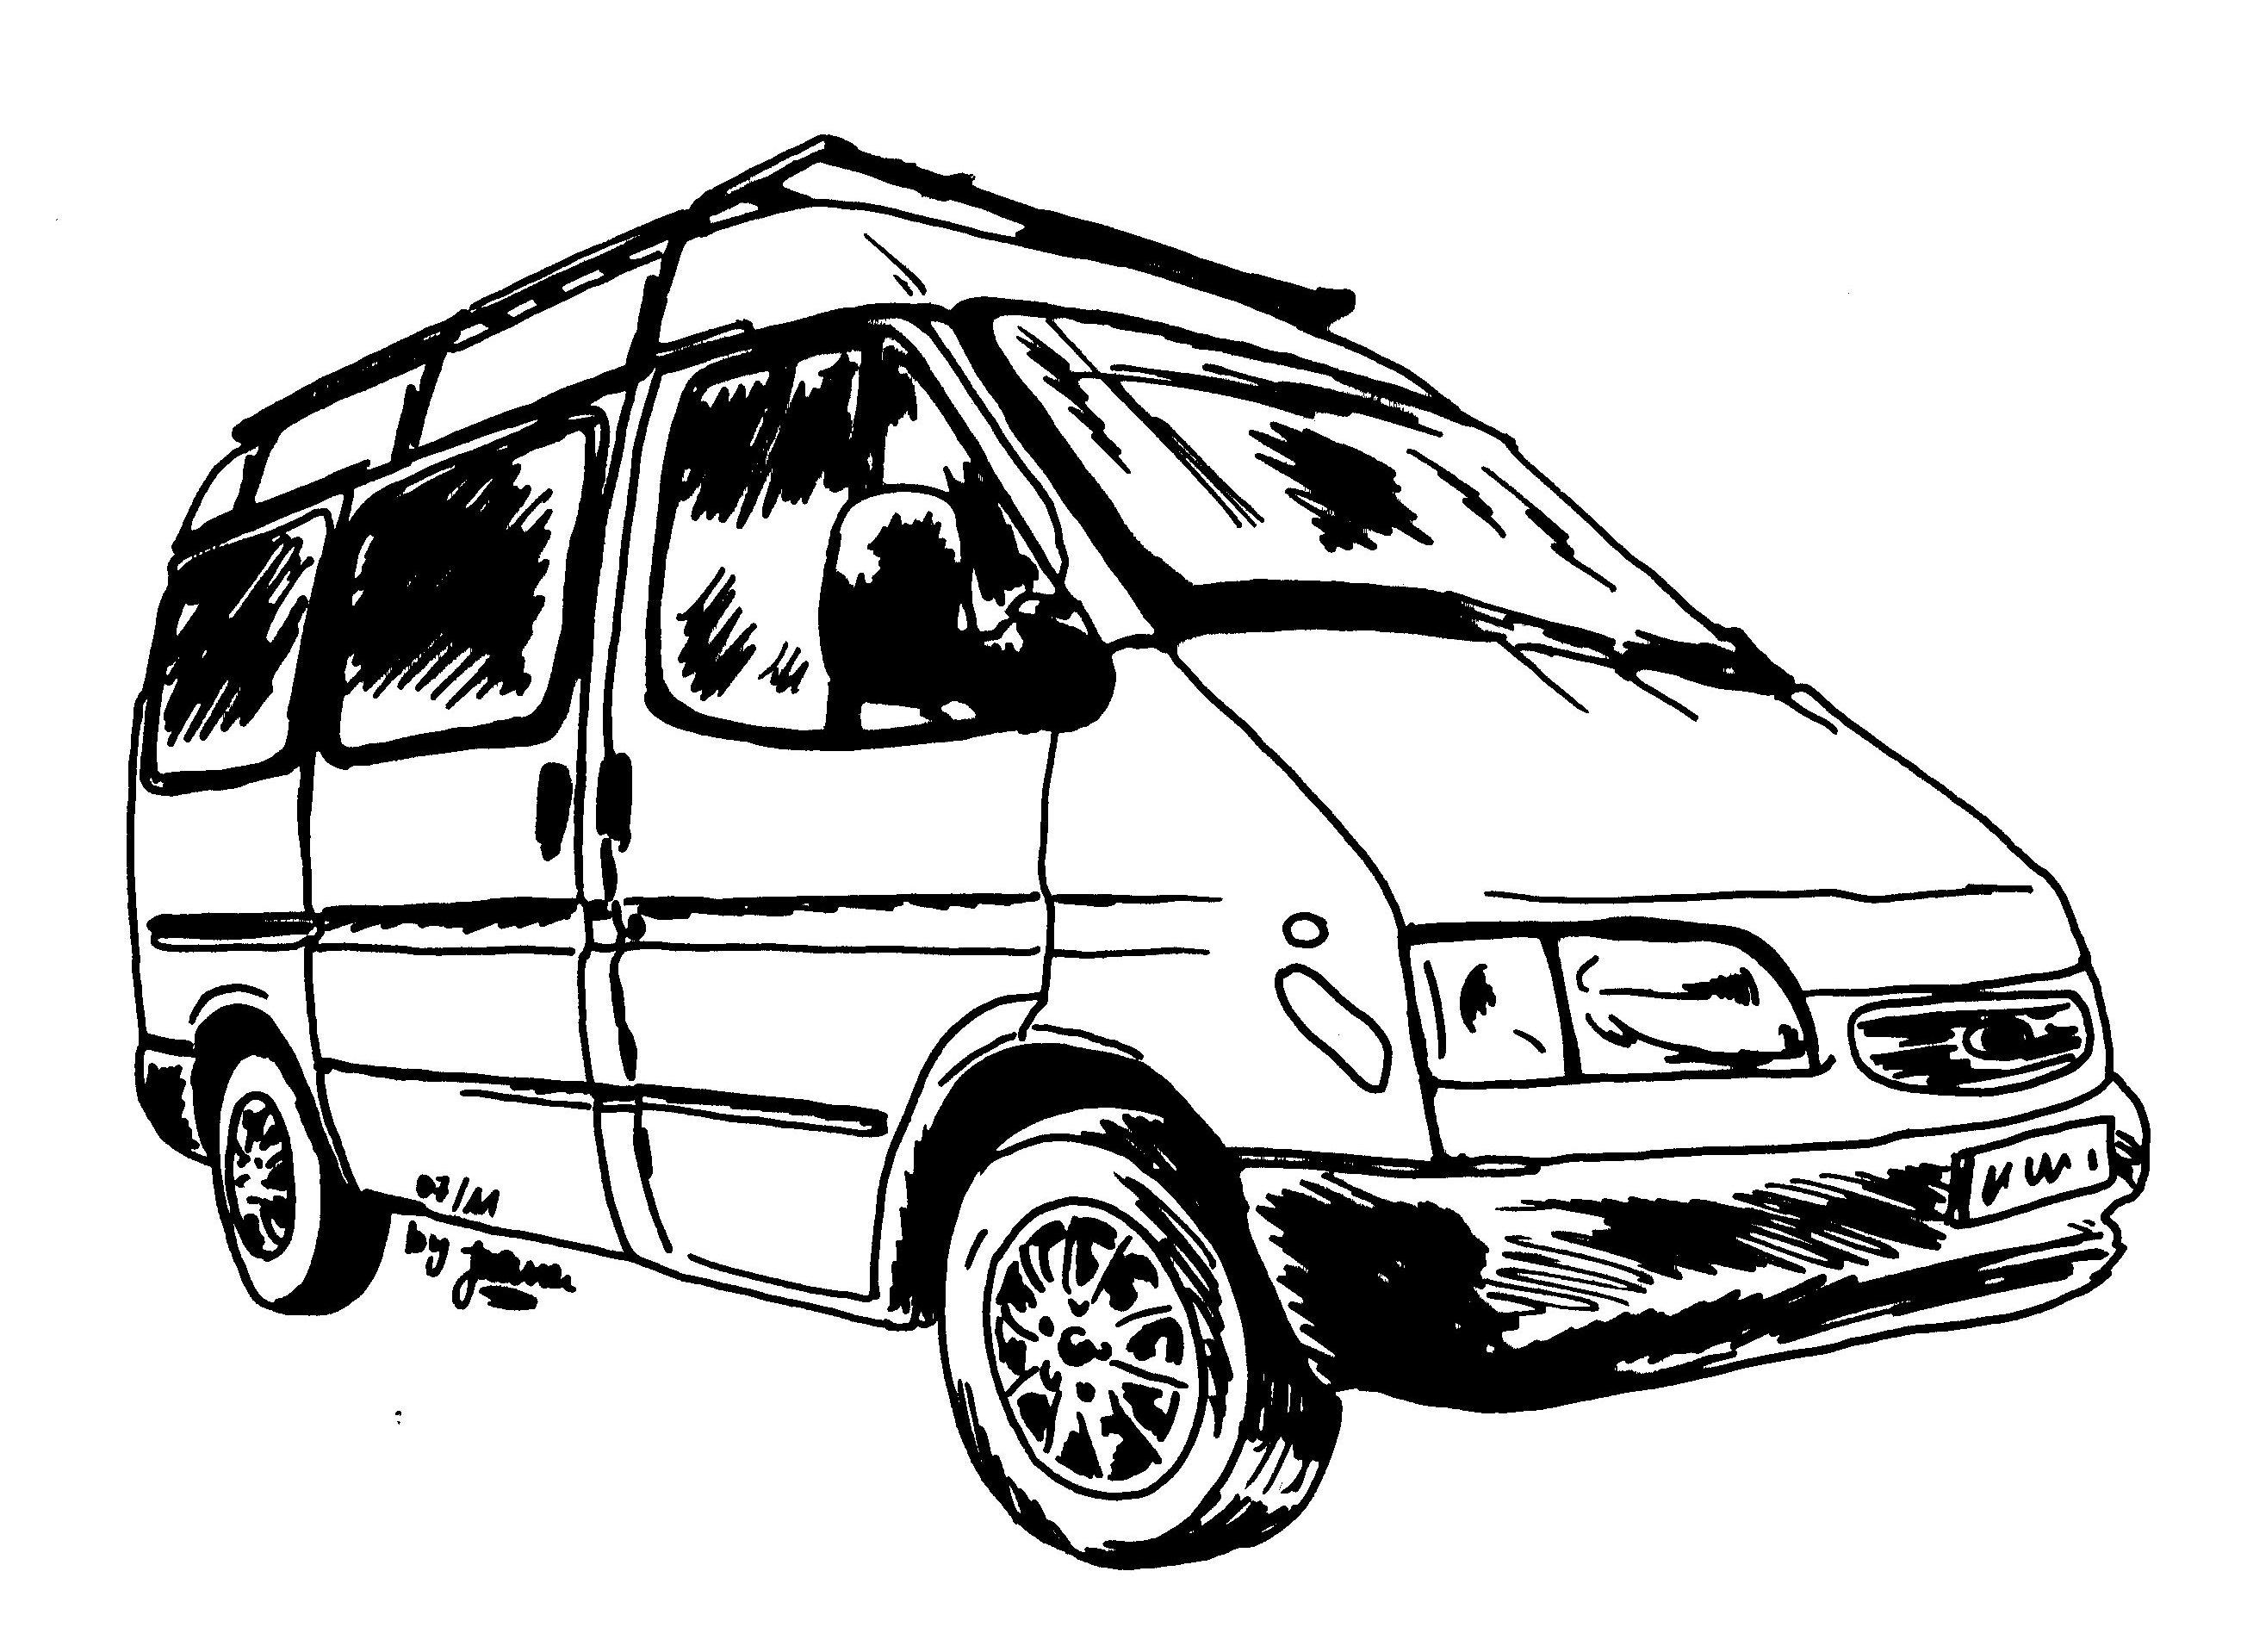 Эмблема форд транзит 4 фотография